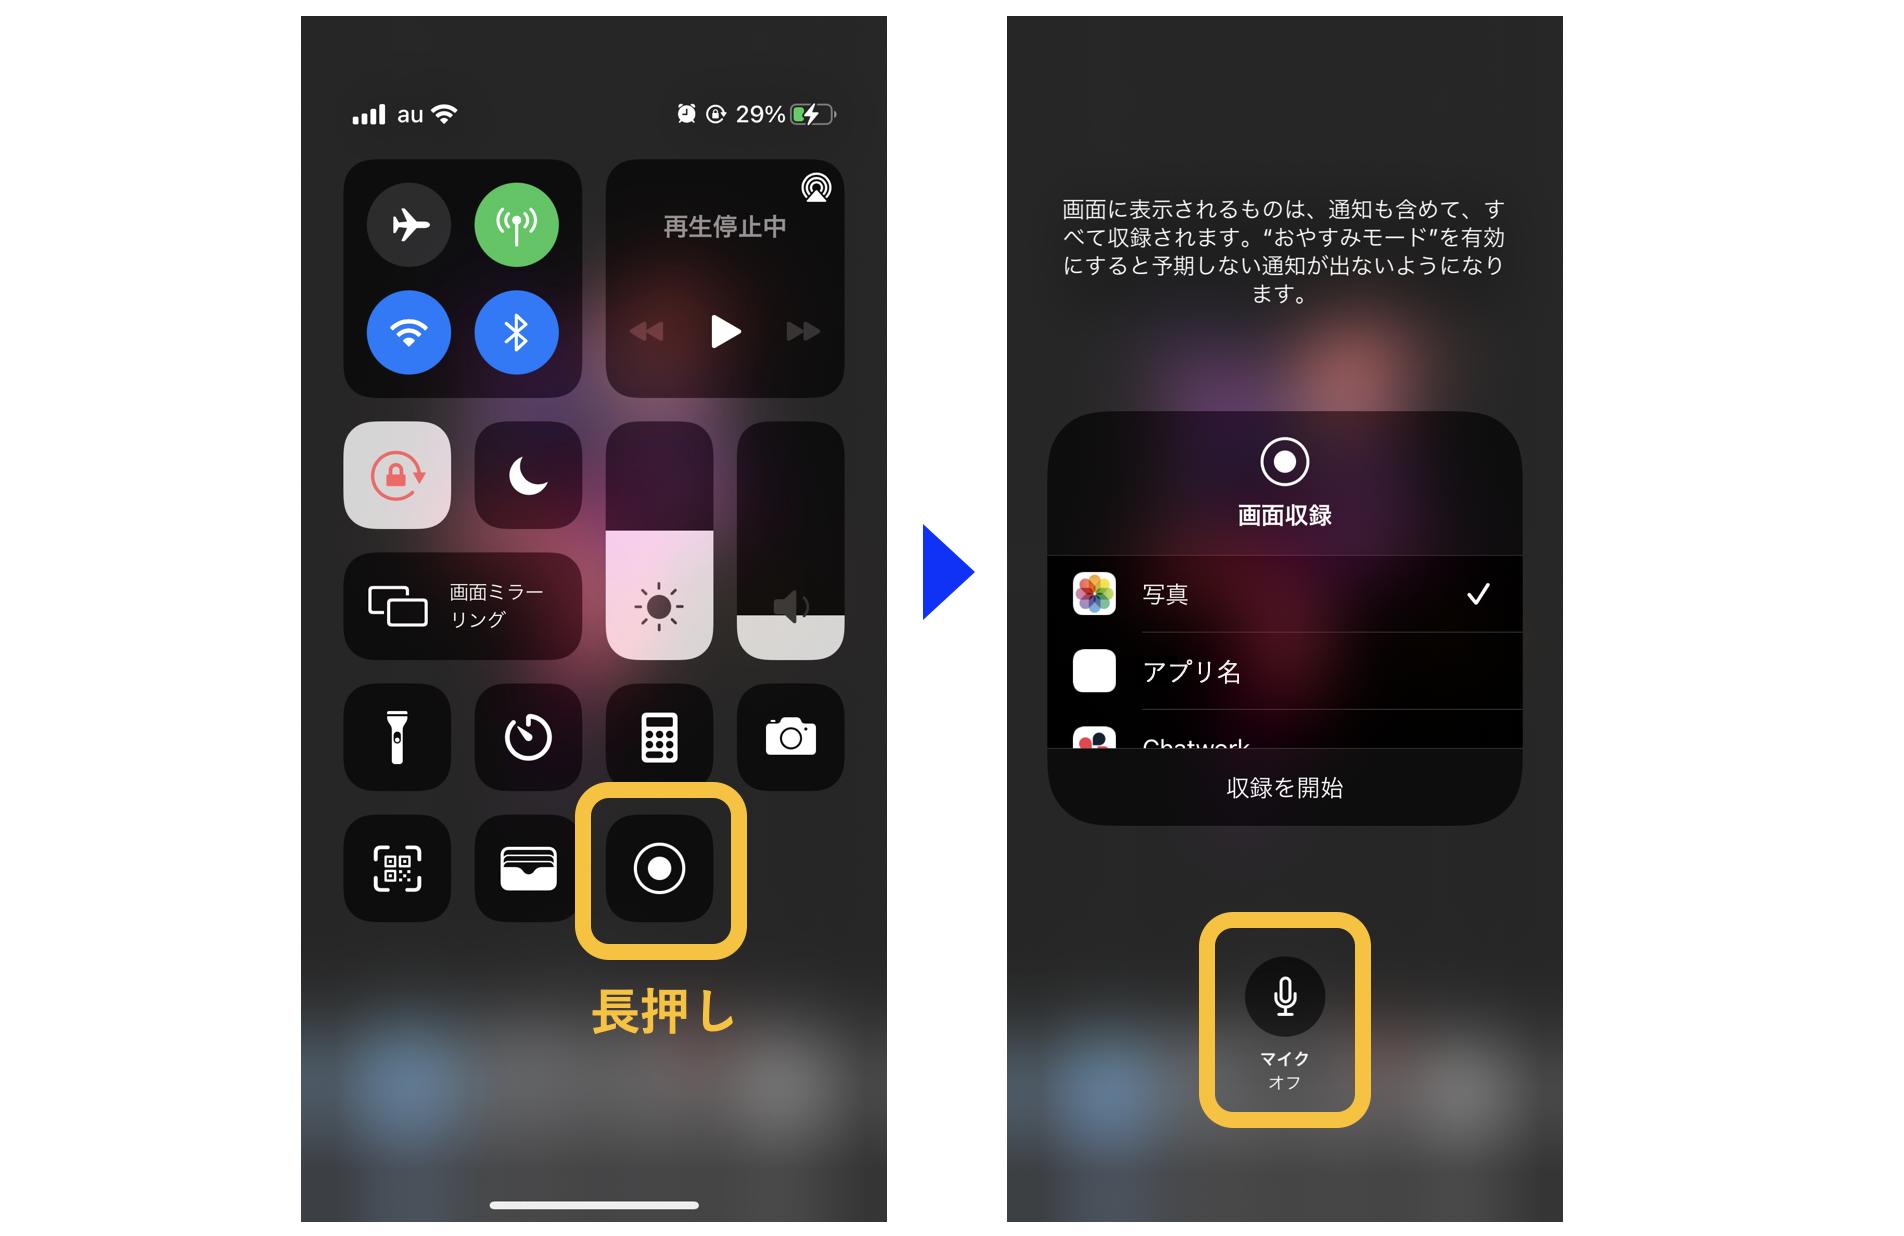 iPhone画面収録で外部音を録るためのマイクのオン・オフ切り替え方法